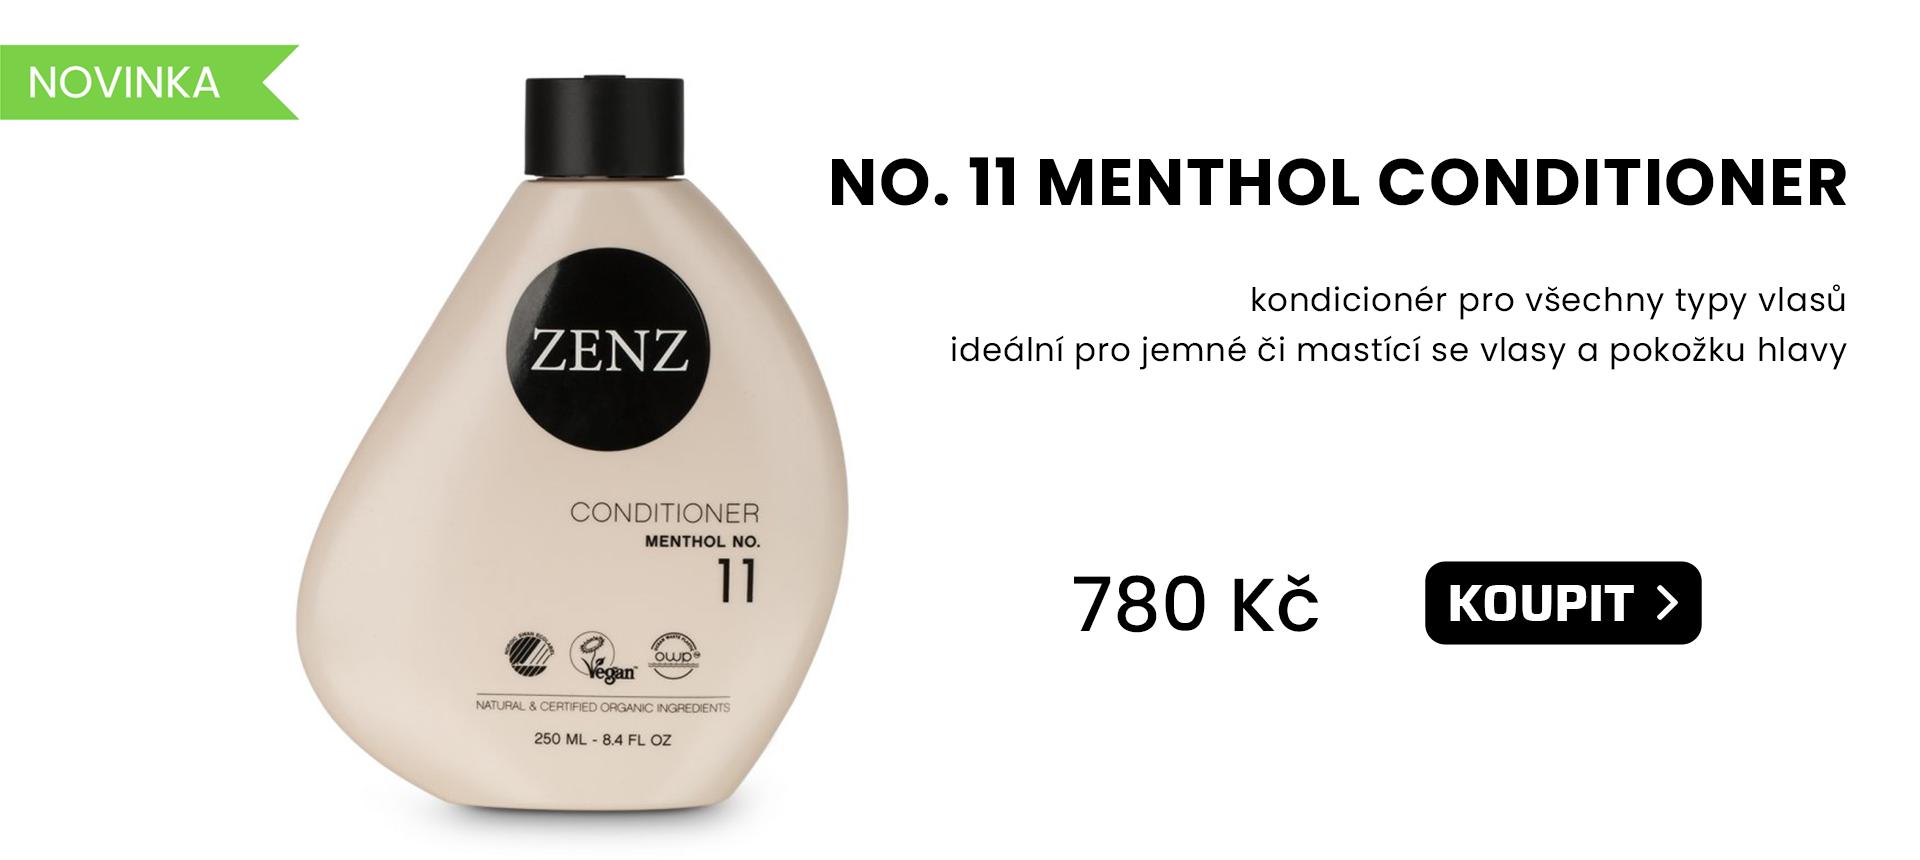 Zenz organic - NO. 11 MENTHOL Conditioner